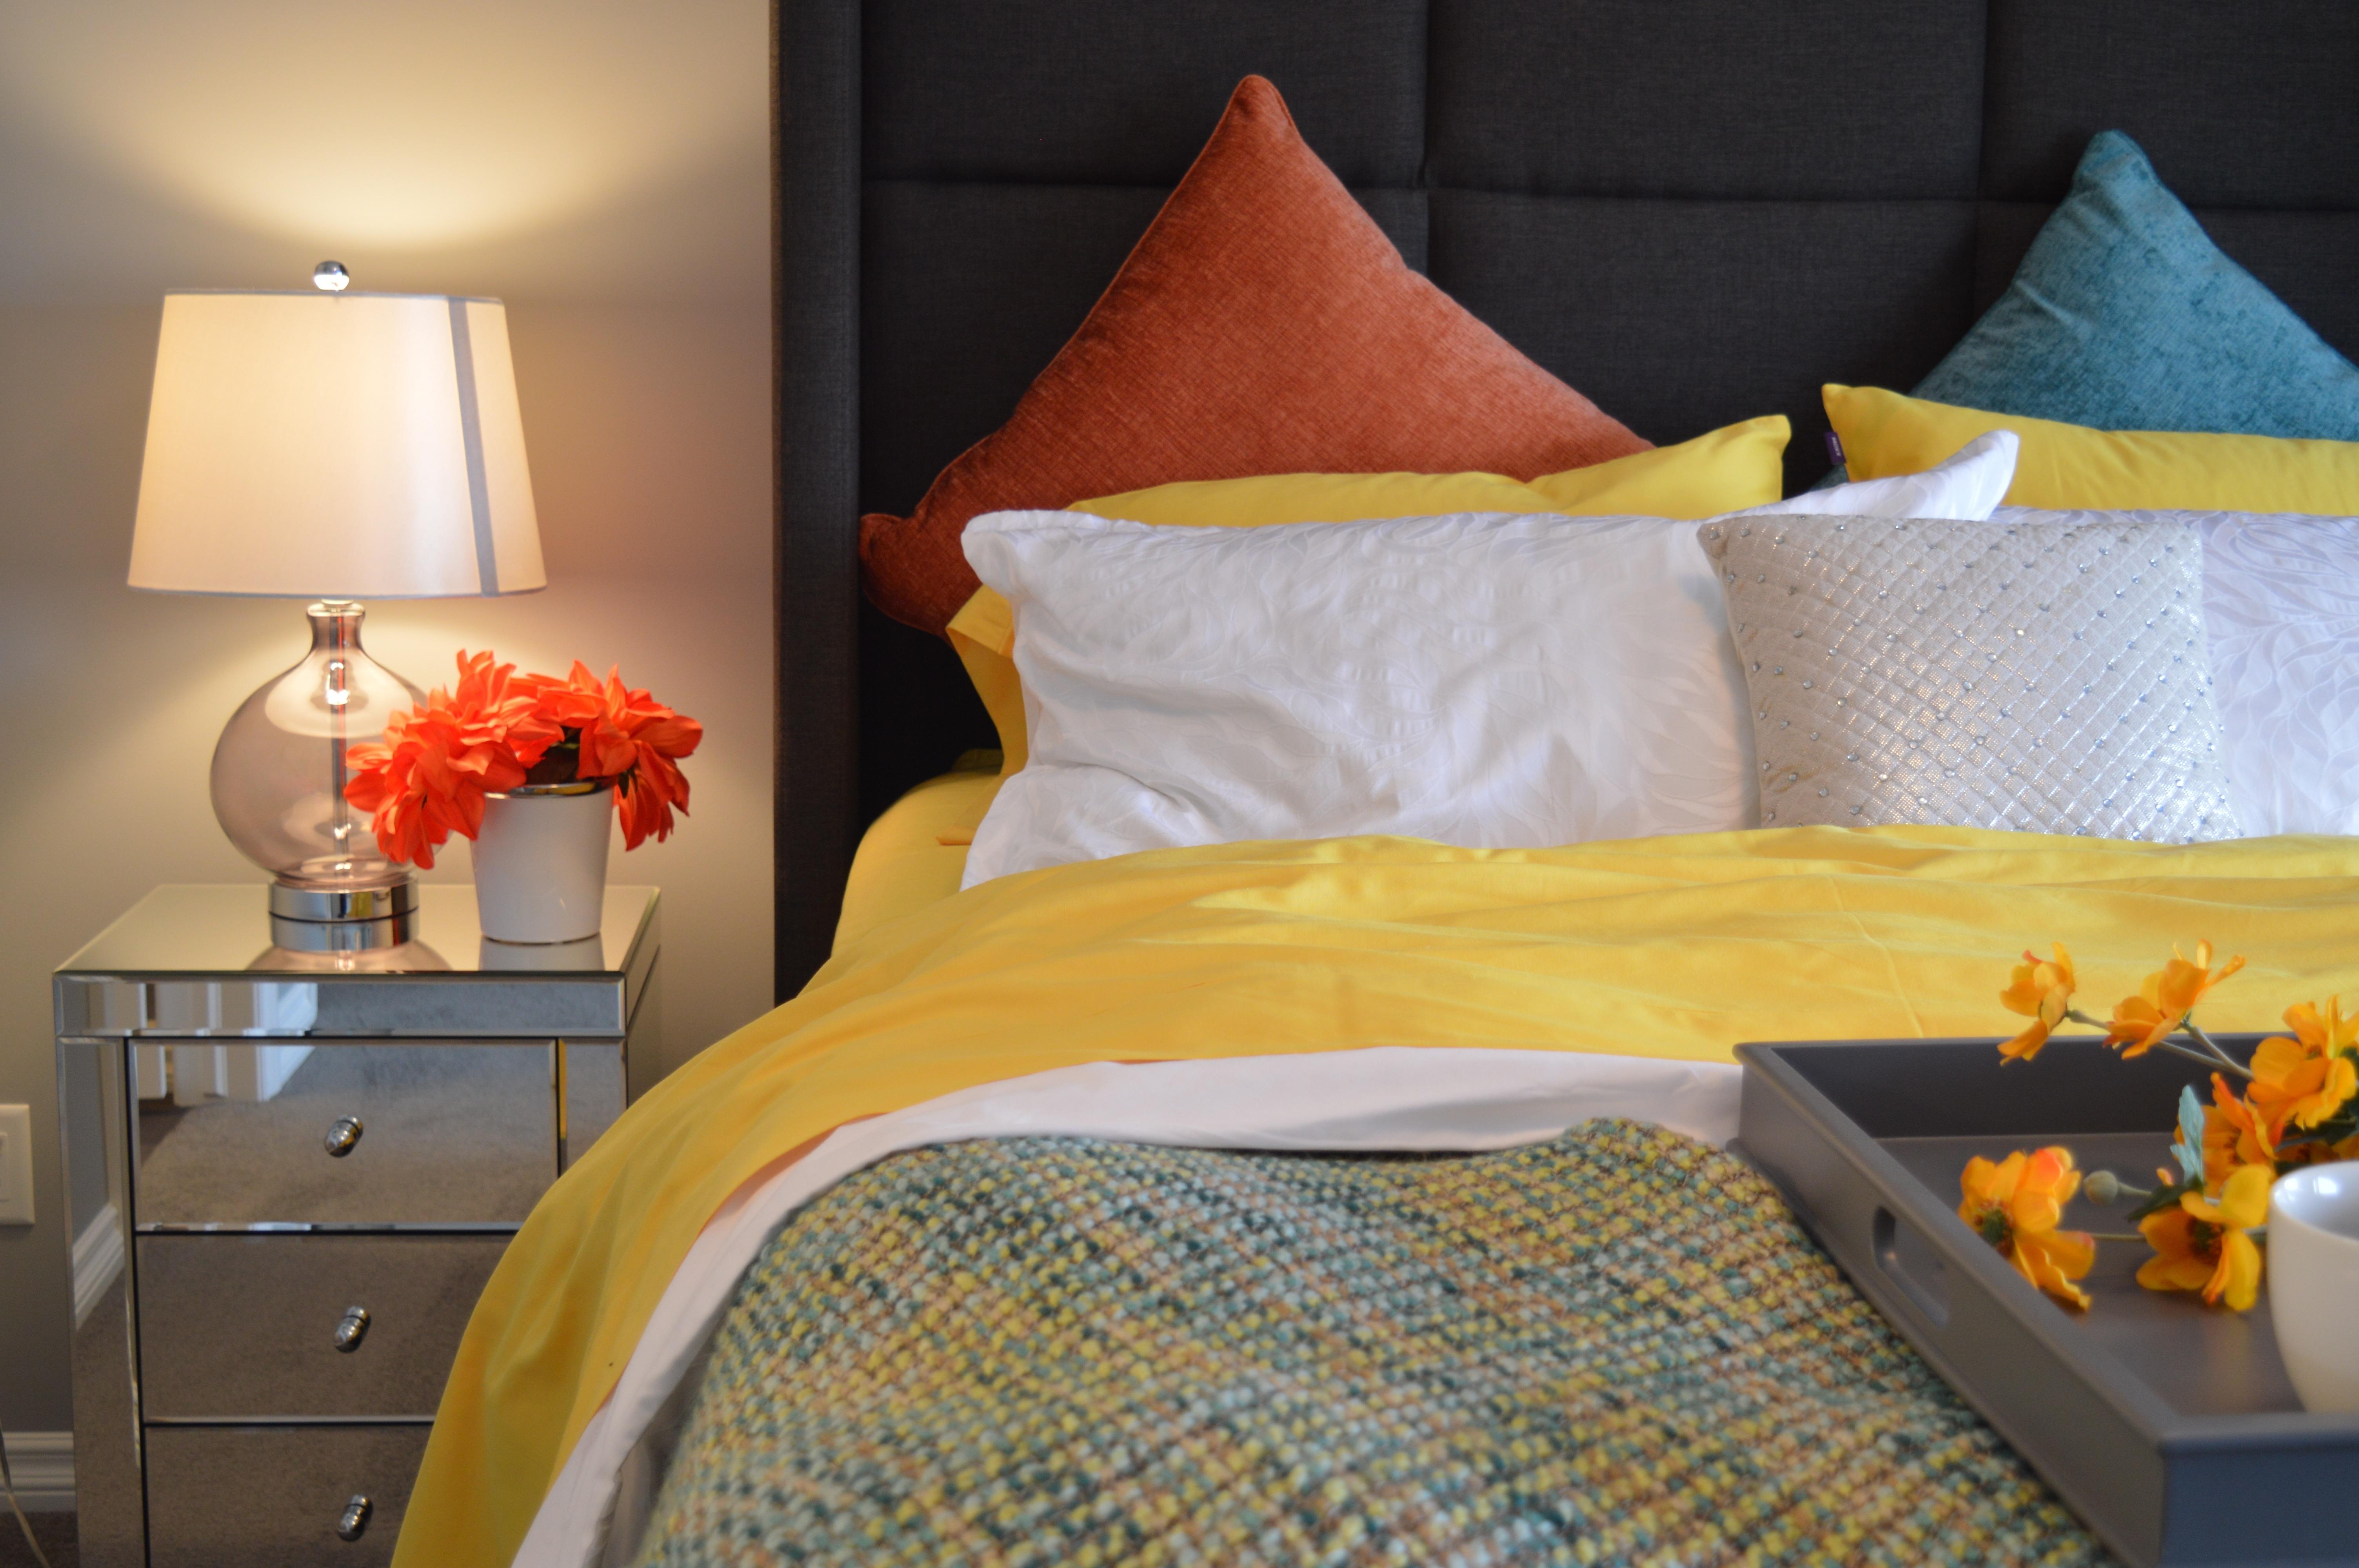 msc linen sheets rajasthani mrs duvet inch online rasthali select yellow print per buy bed treads rajasthali